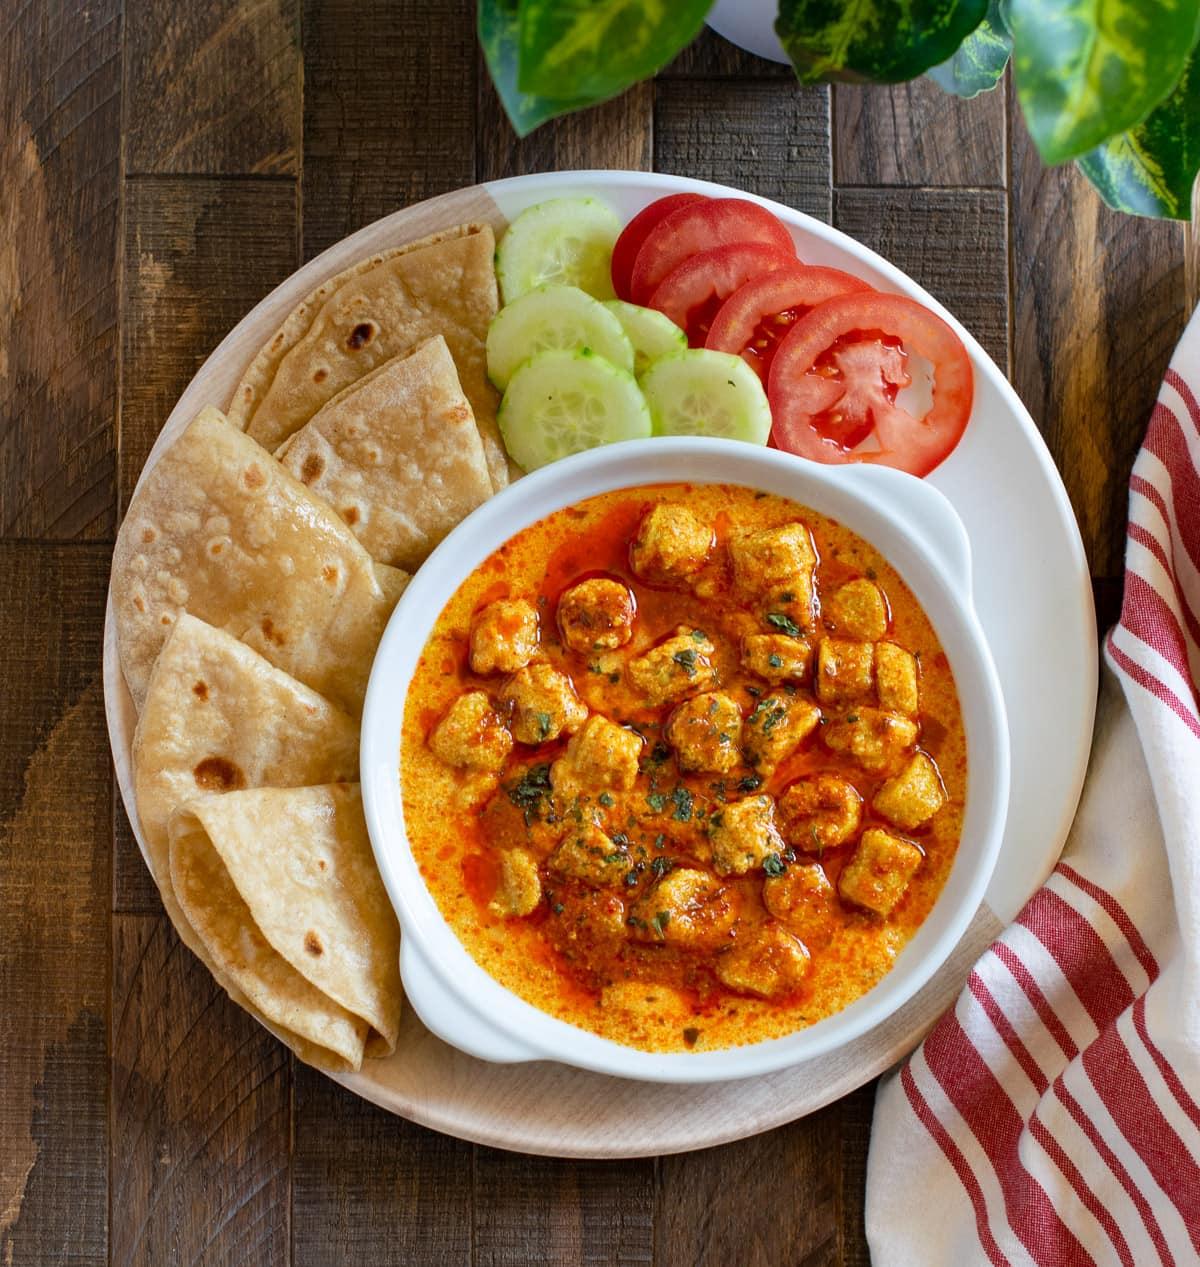 Gatte ki sabji on a white plate with rotis and salad